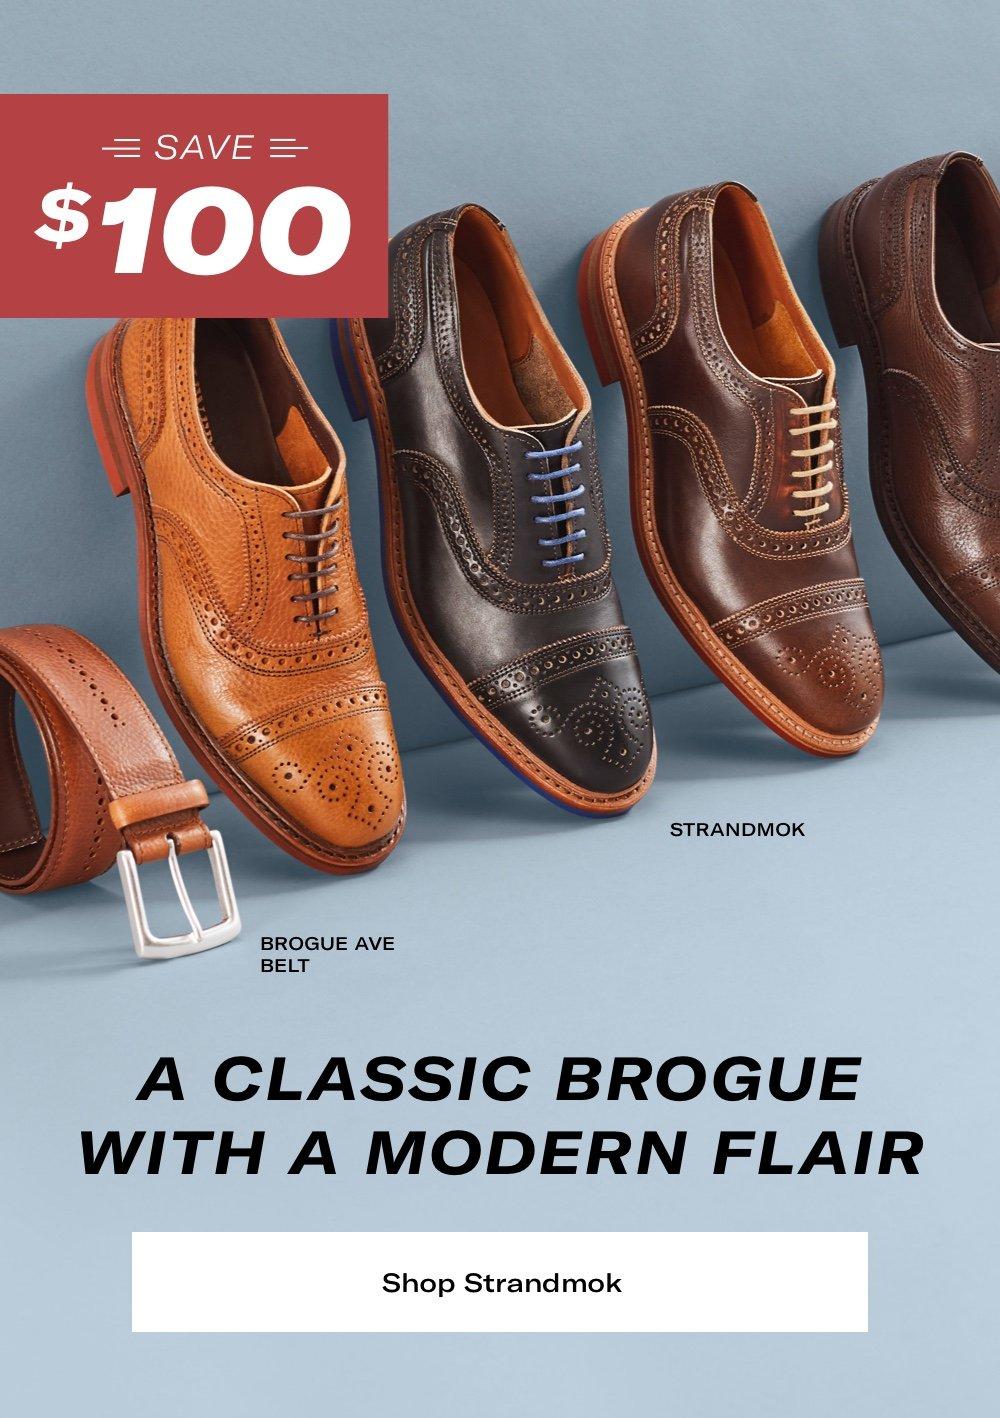 A Classic Brogue With a Modern Flair. Save $100 on Strandmoks